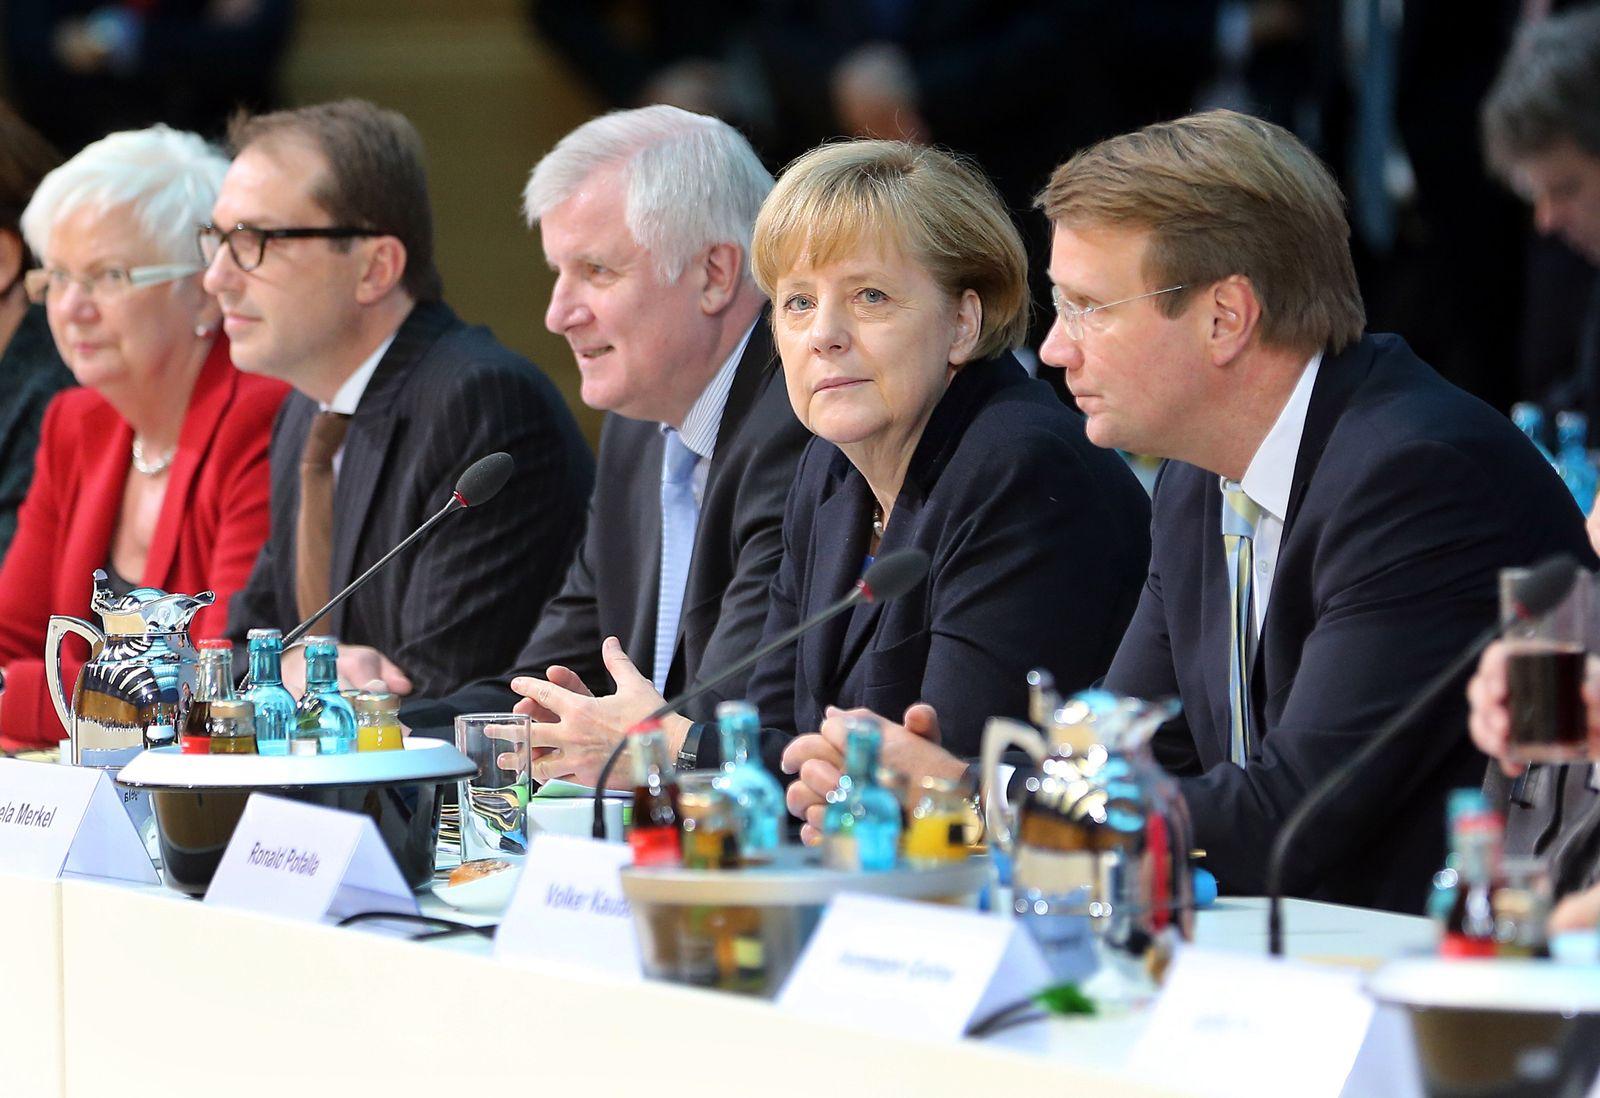 Koalititonsverhandlungen